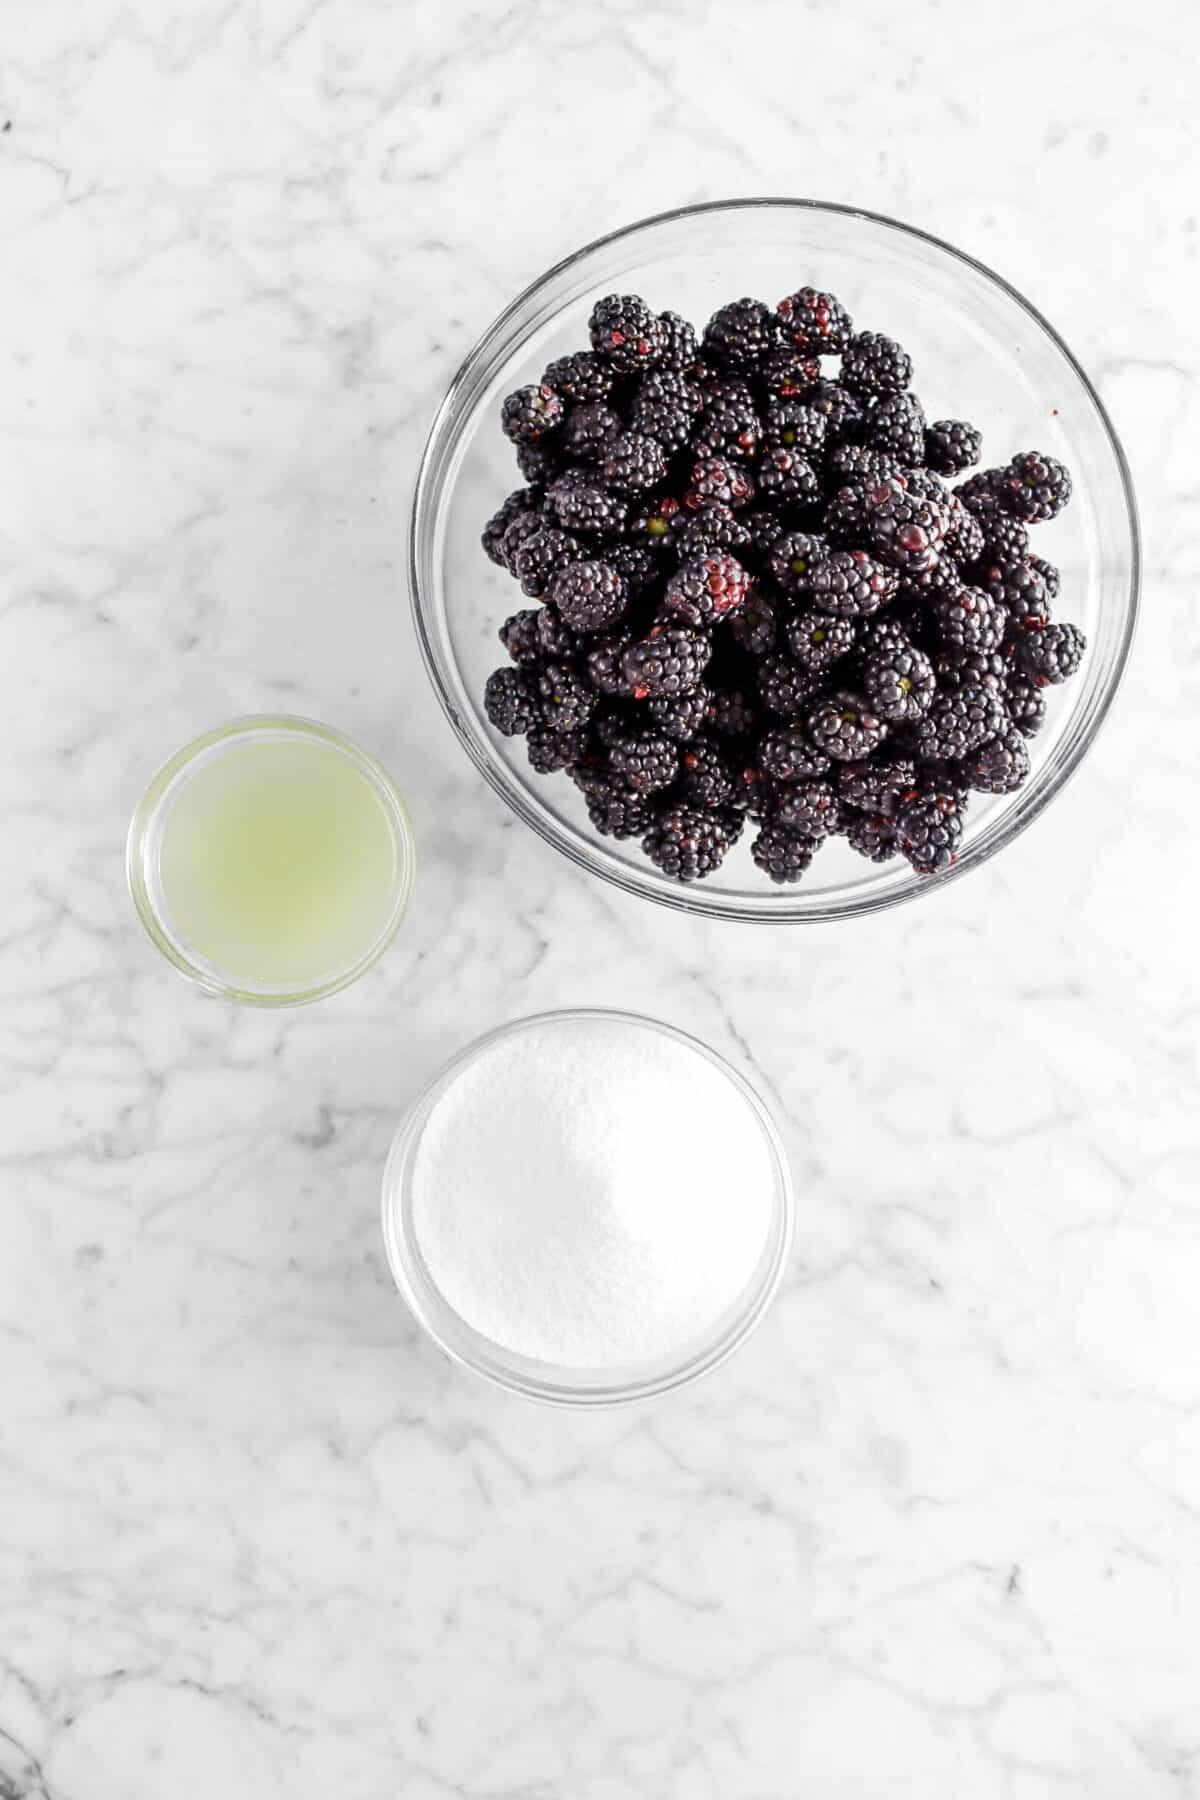 blackberry jam, lemon juice, and sugar in glass bowls